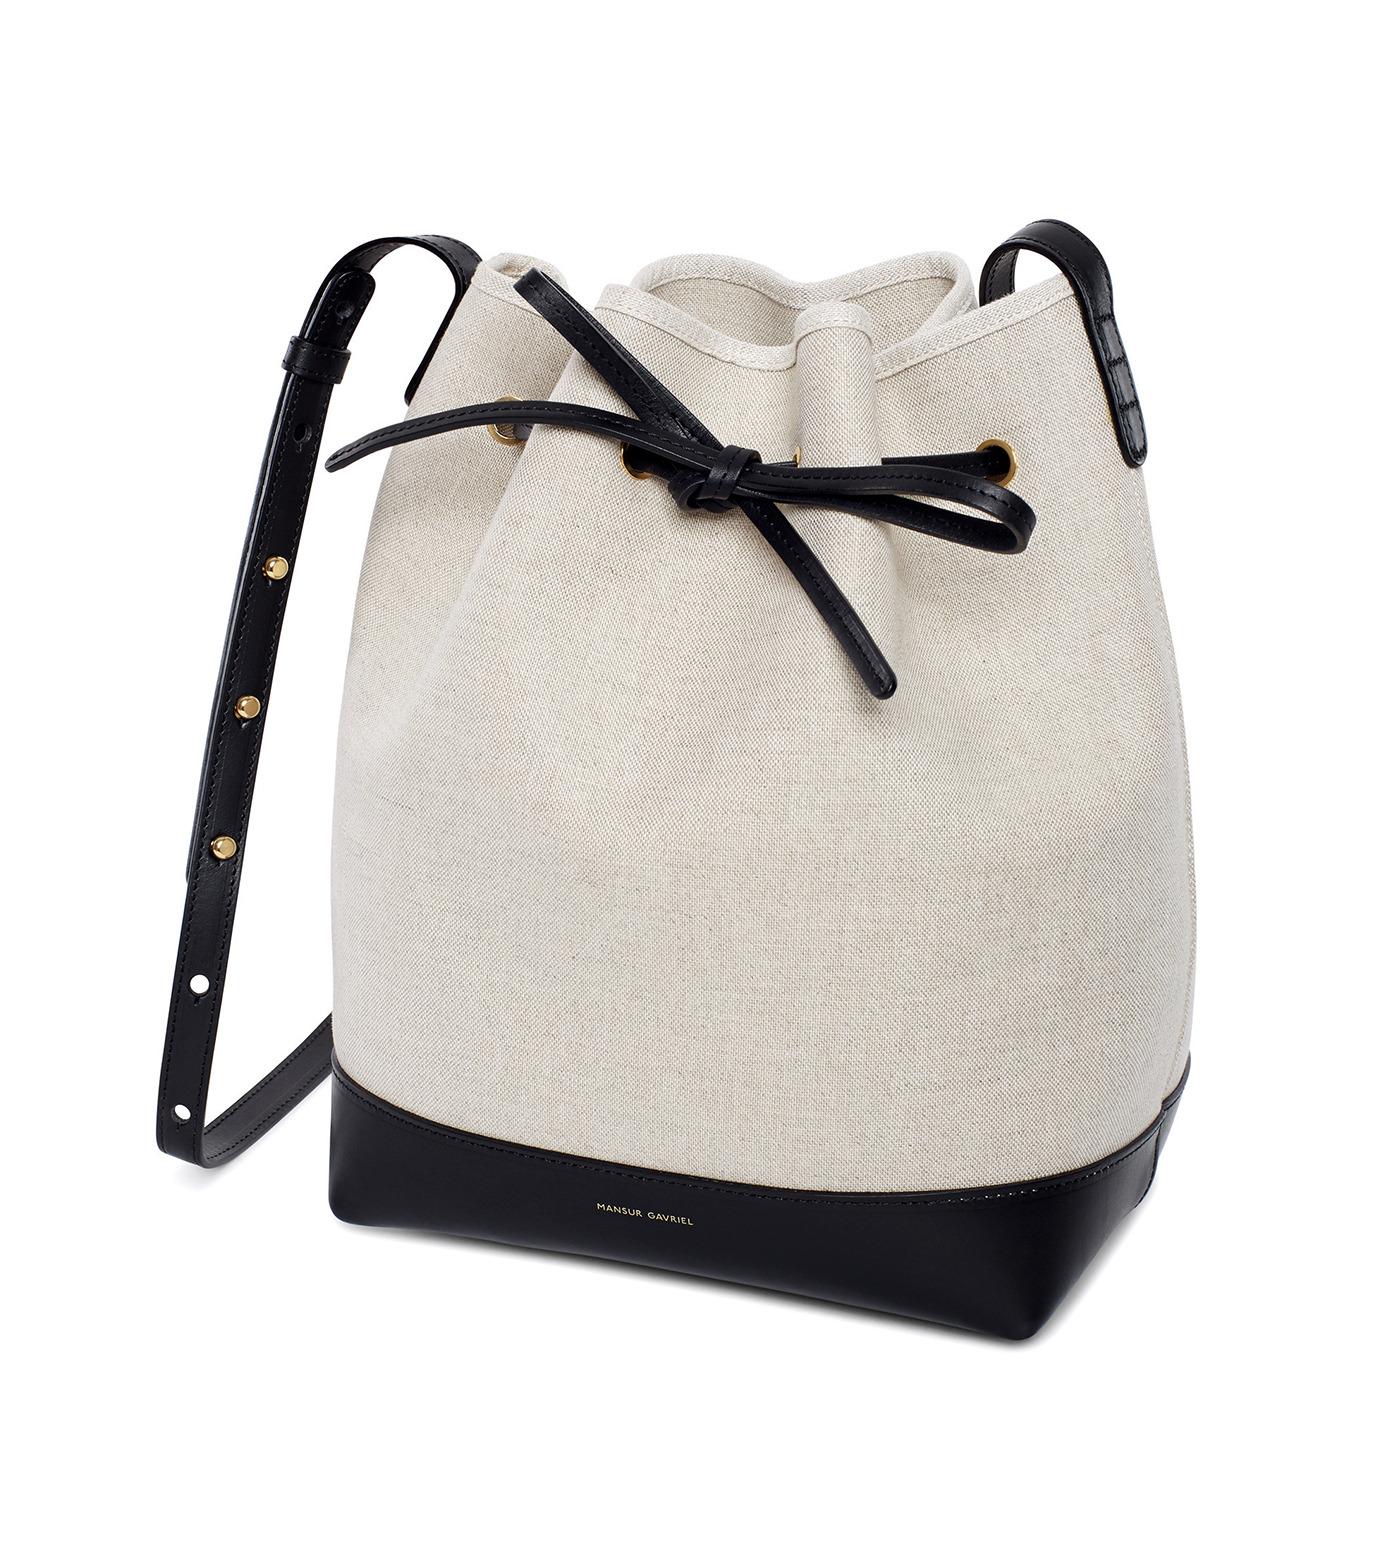 Mansur Gavriel(マンサーガブリエル)のCanvas Bucket Bag-WHITE(バッグ/bag)-HBB003CN-5 拡大詳細画像2